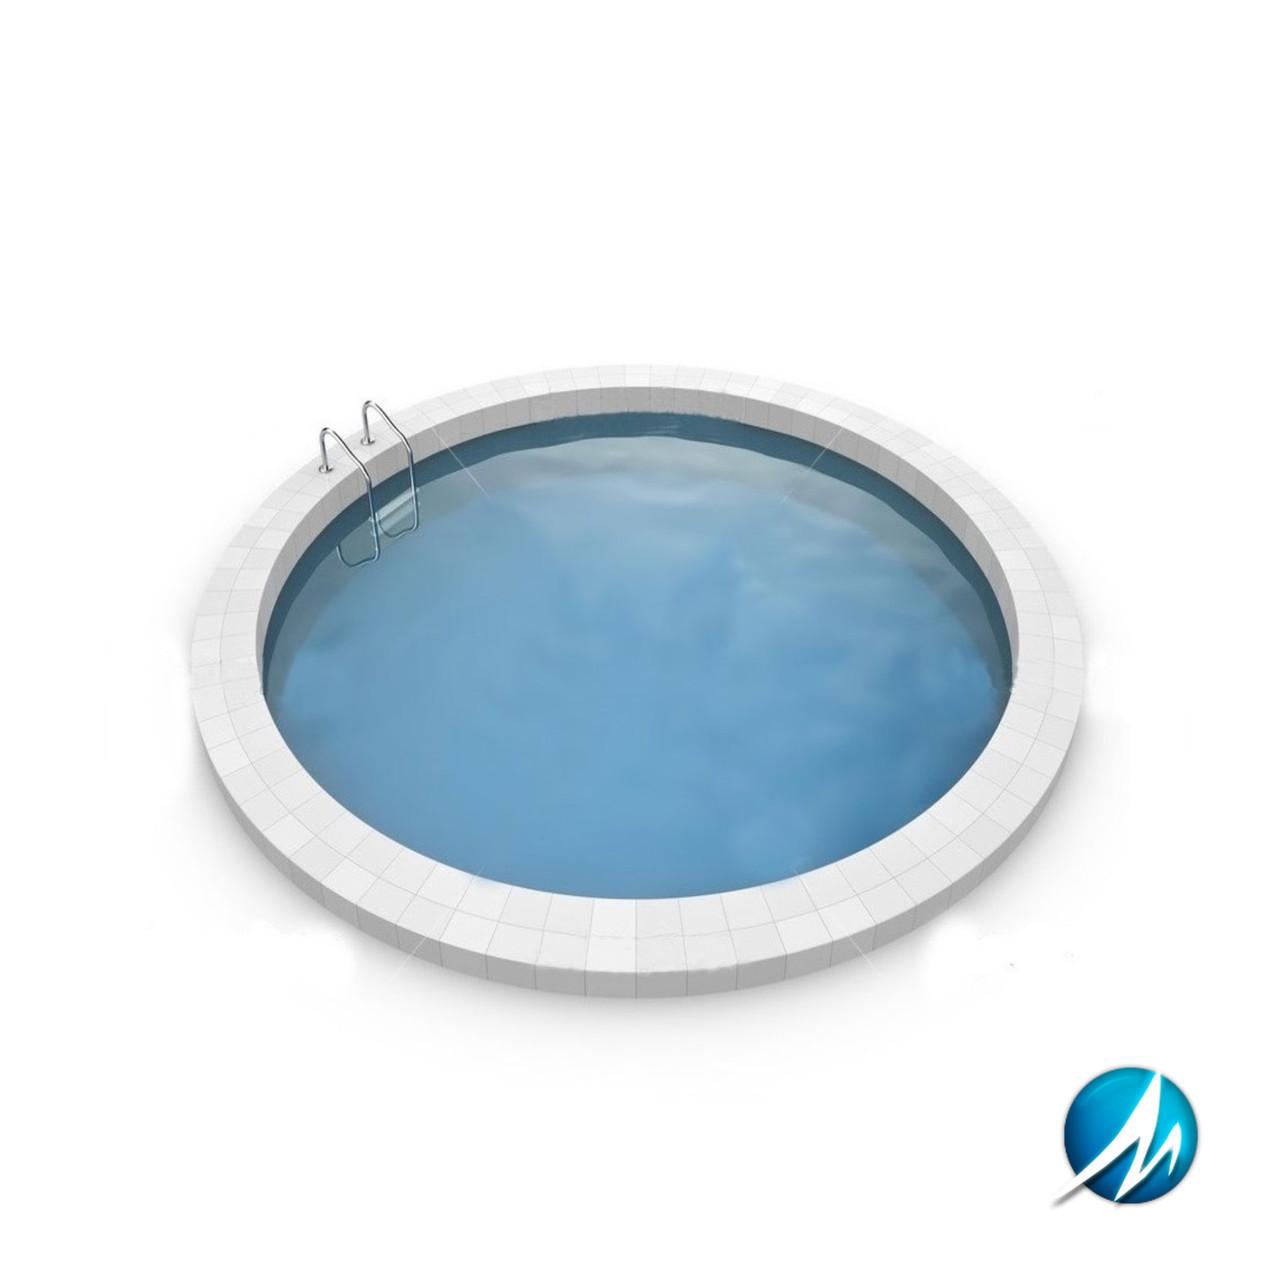 Сборный круглый бассейн MILANO 5,00х1,5 м, пленка 0,6 мм